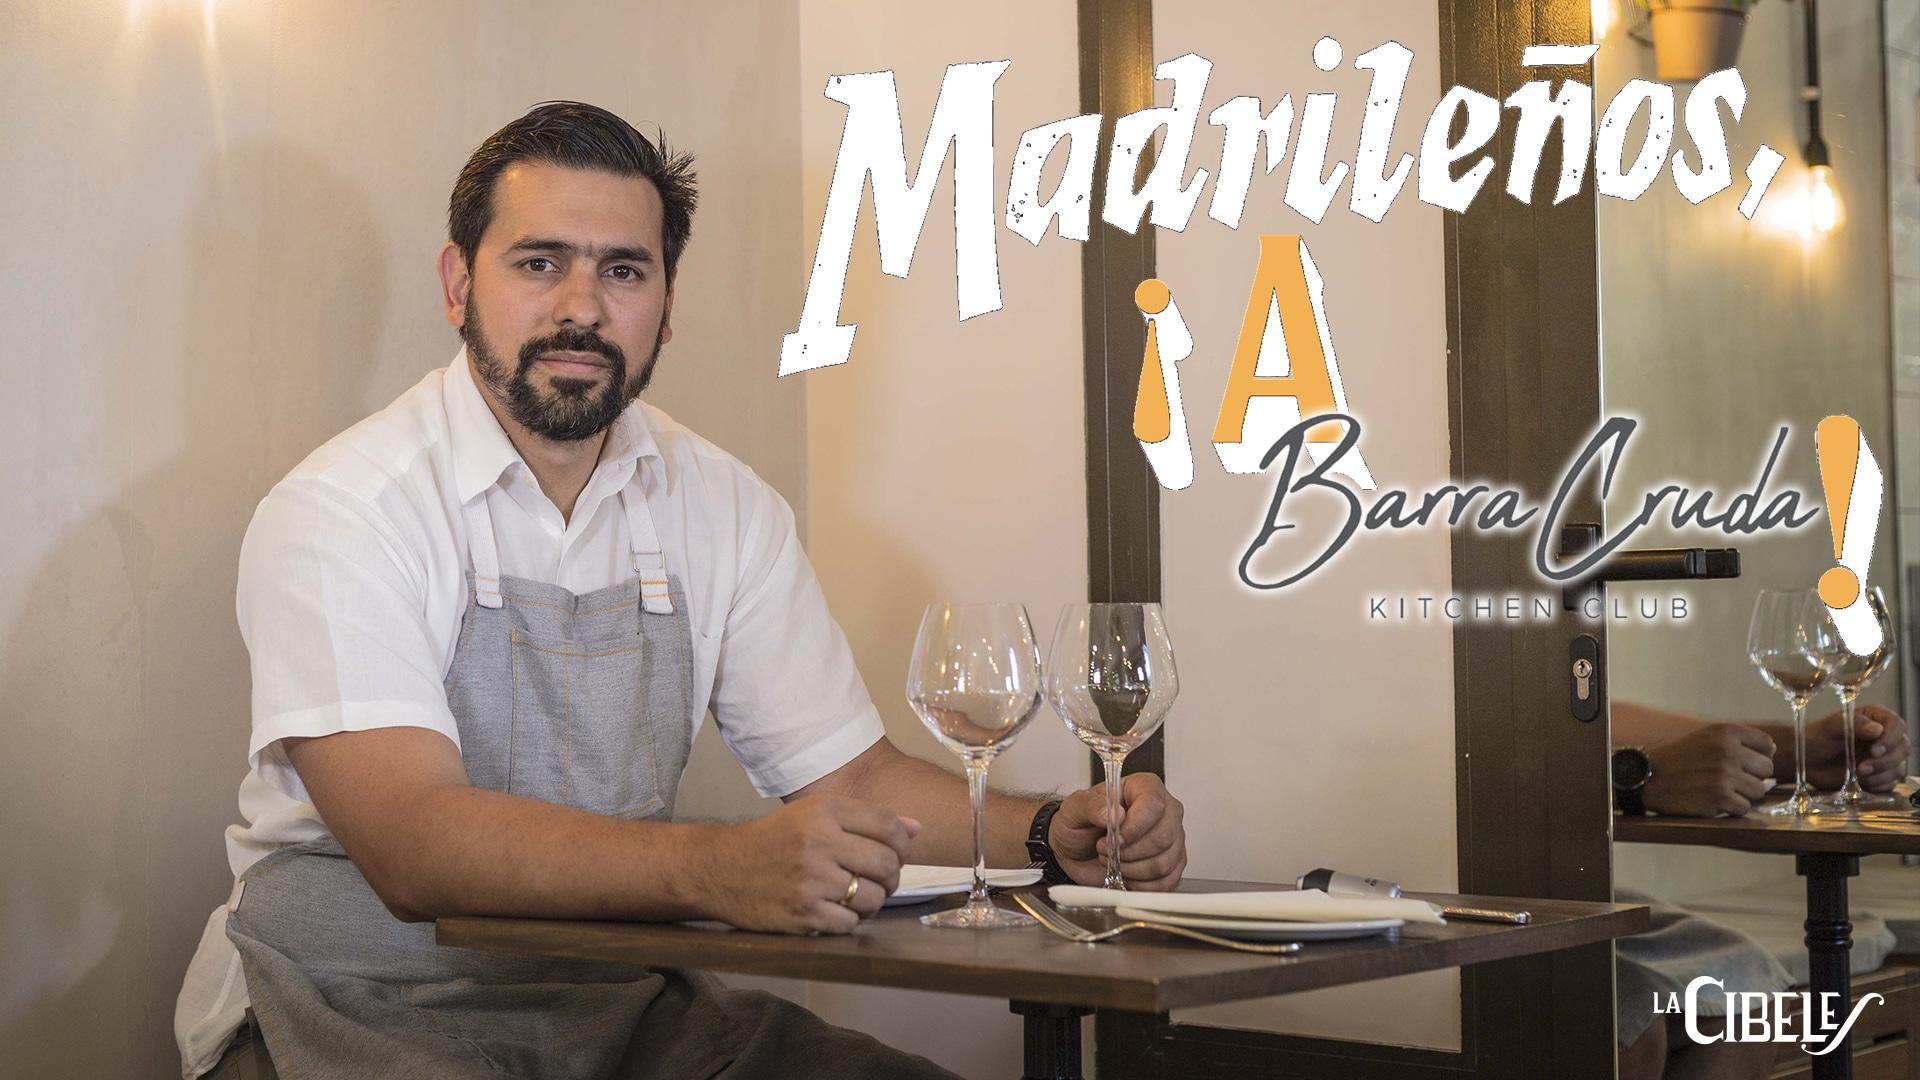 Barracruda Madrid